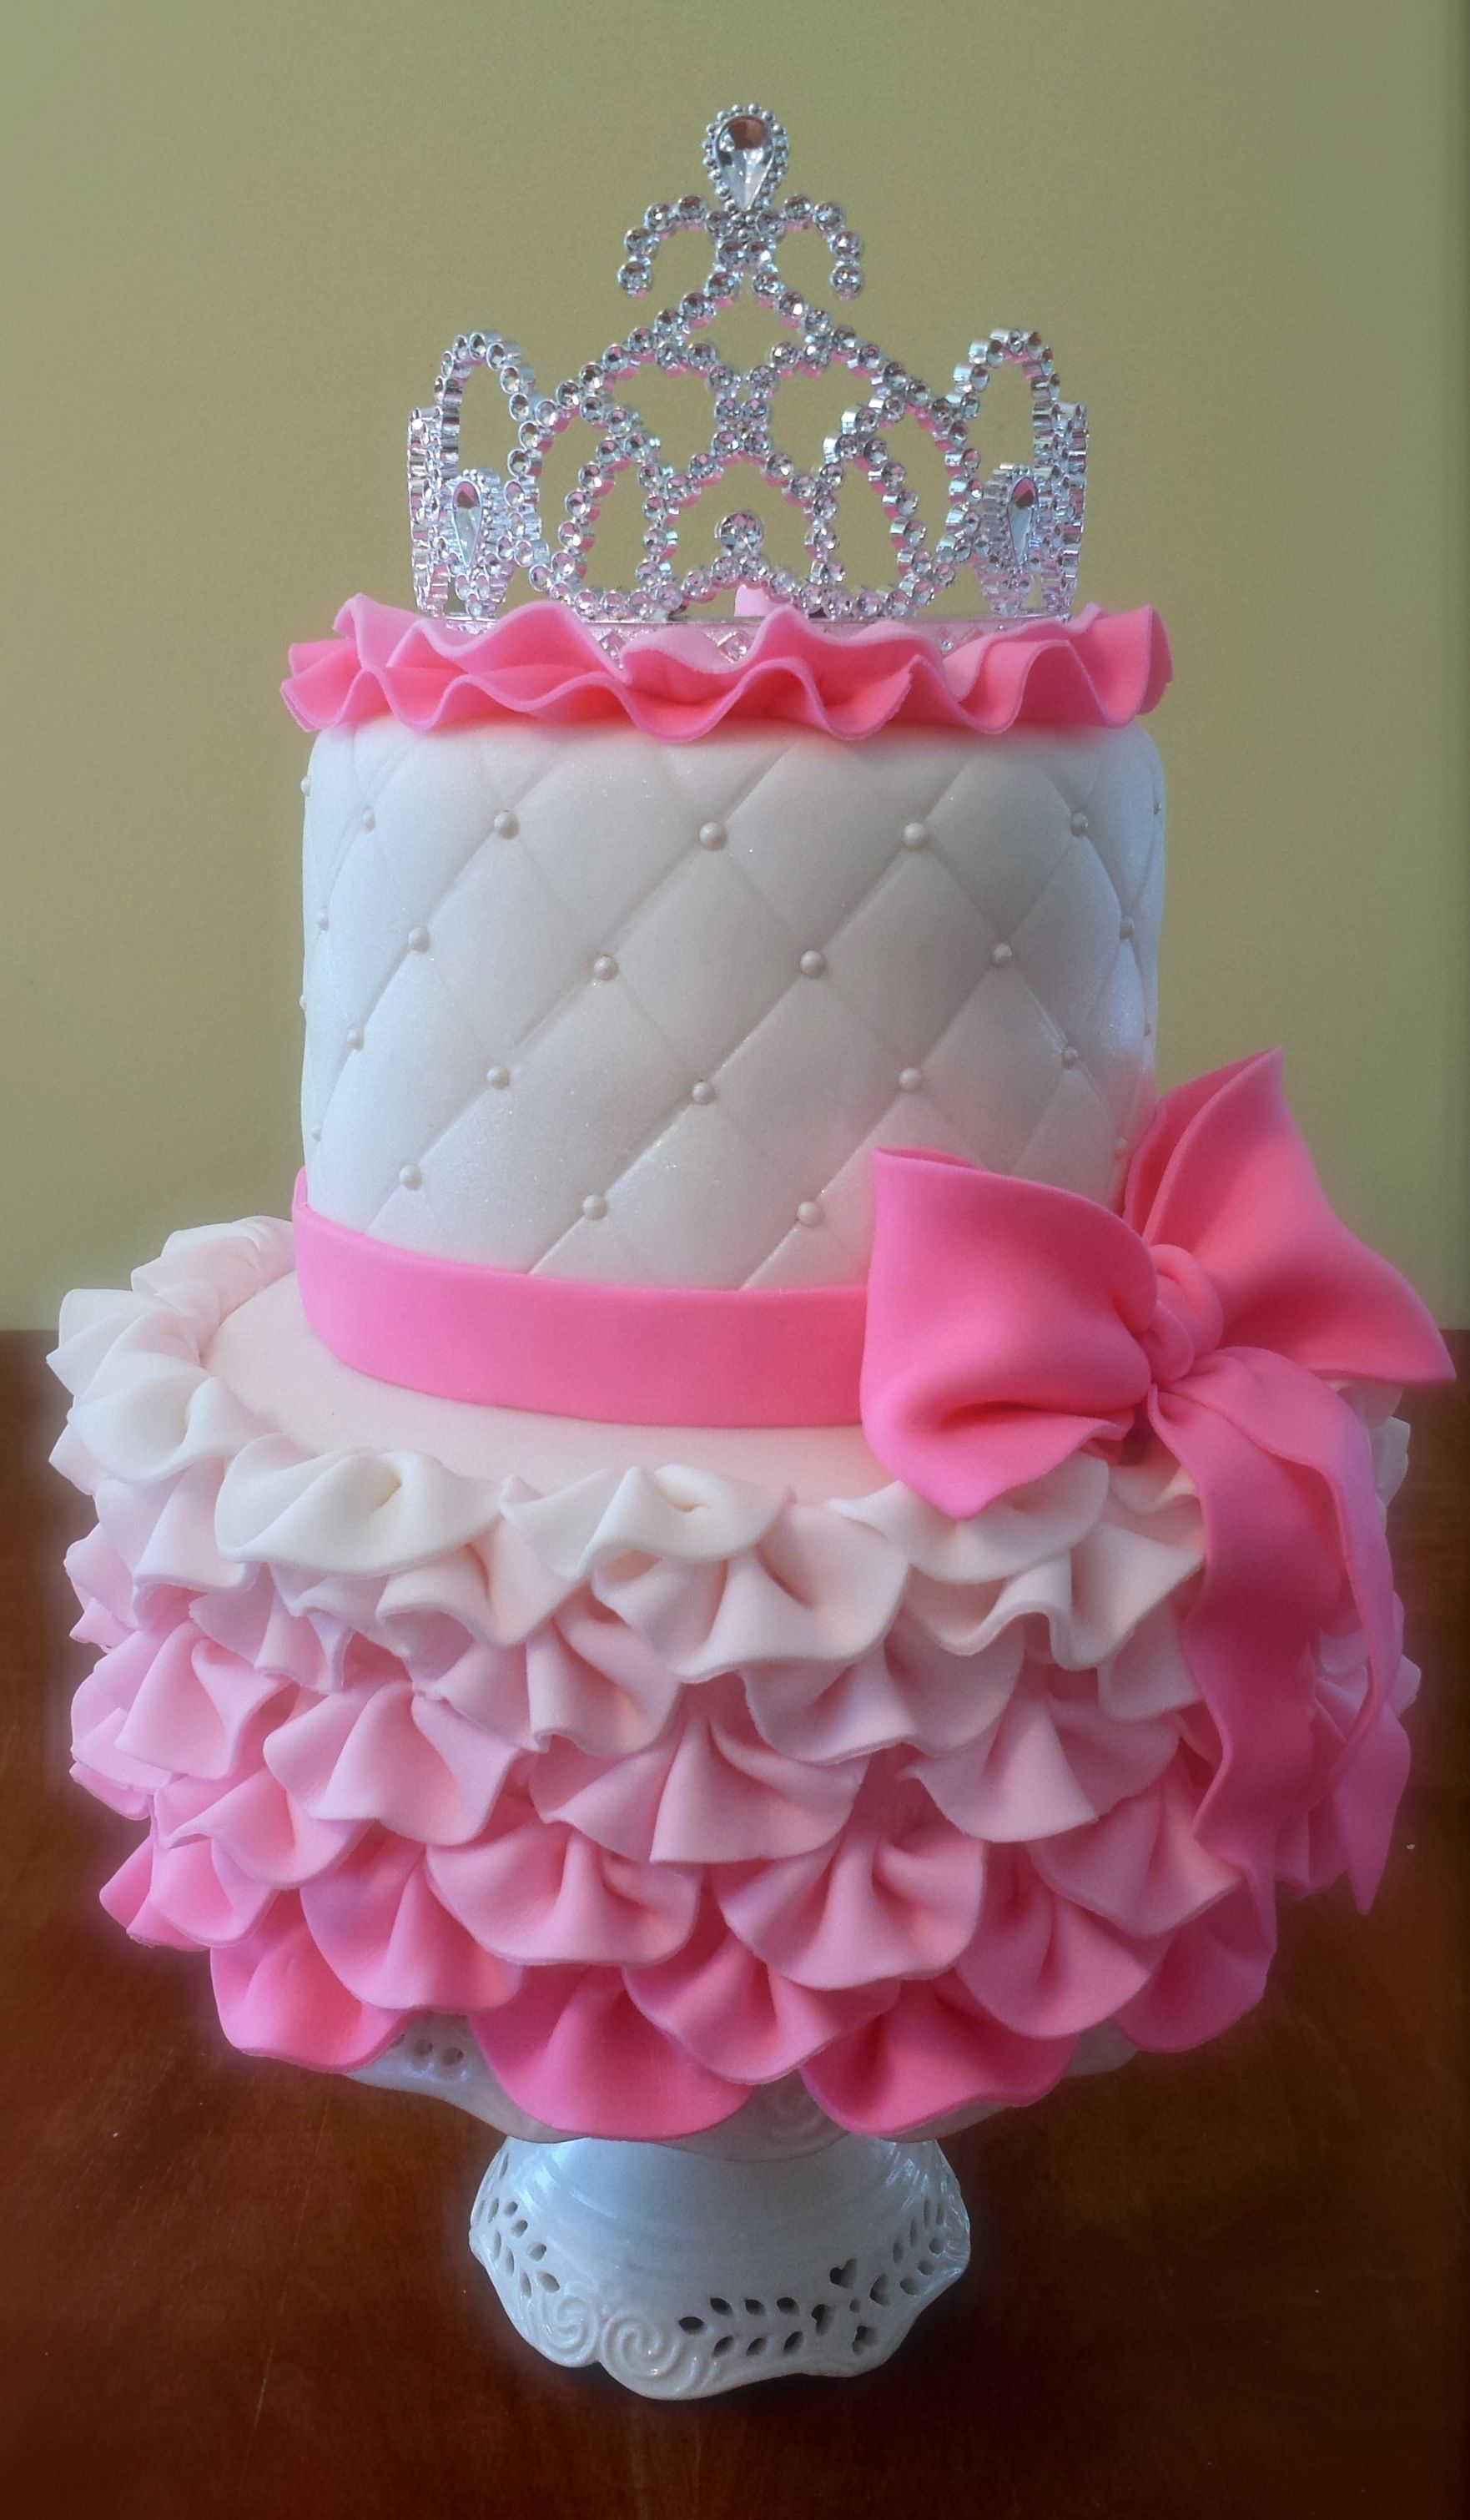 Cake Blog Princess Cake Tutorial Birthday Cake Girls Girl Cakes Cake Blog